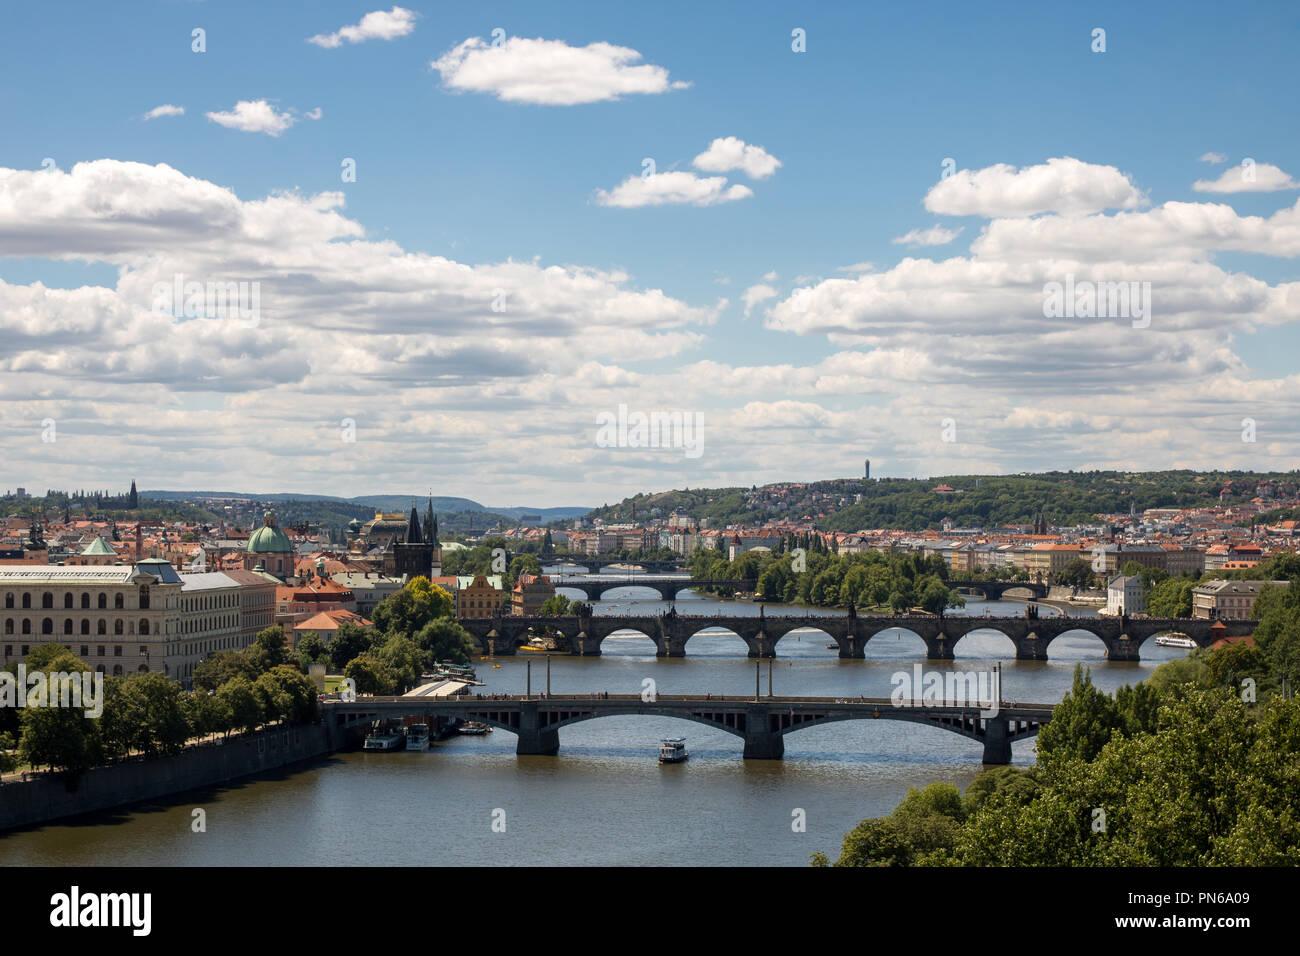 Bridges on Vltava river in Prague, Czech Republic - Stock Image